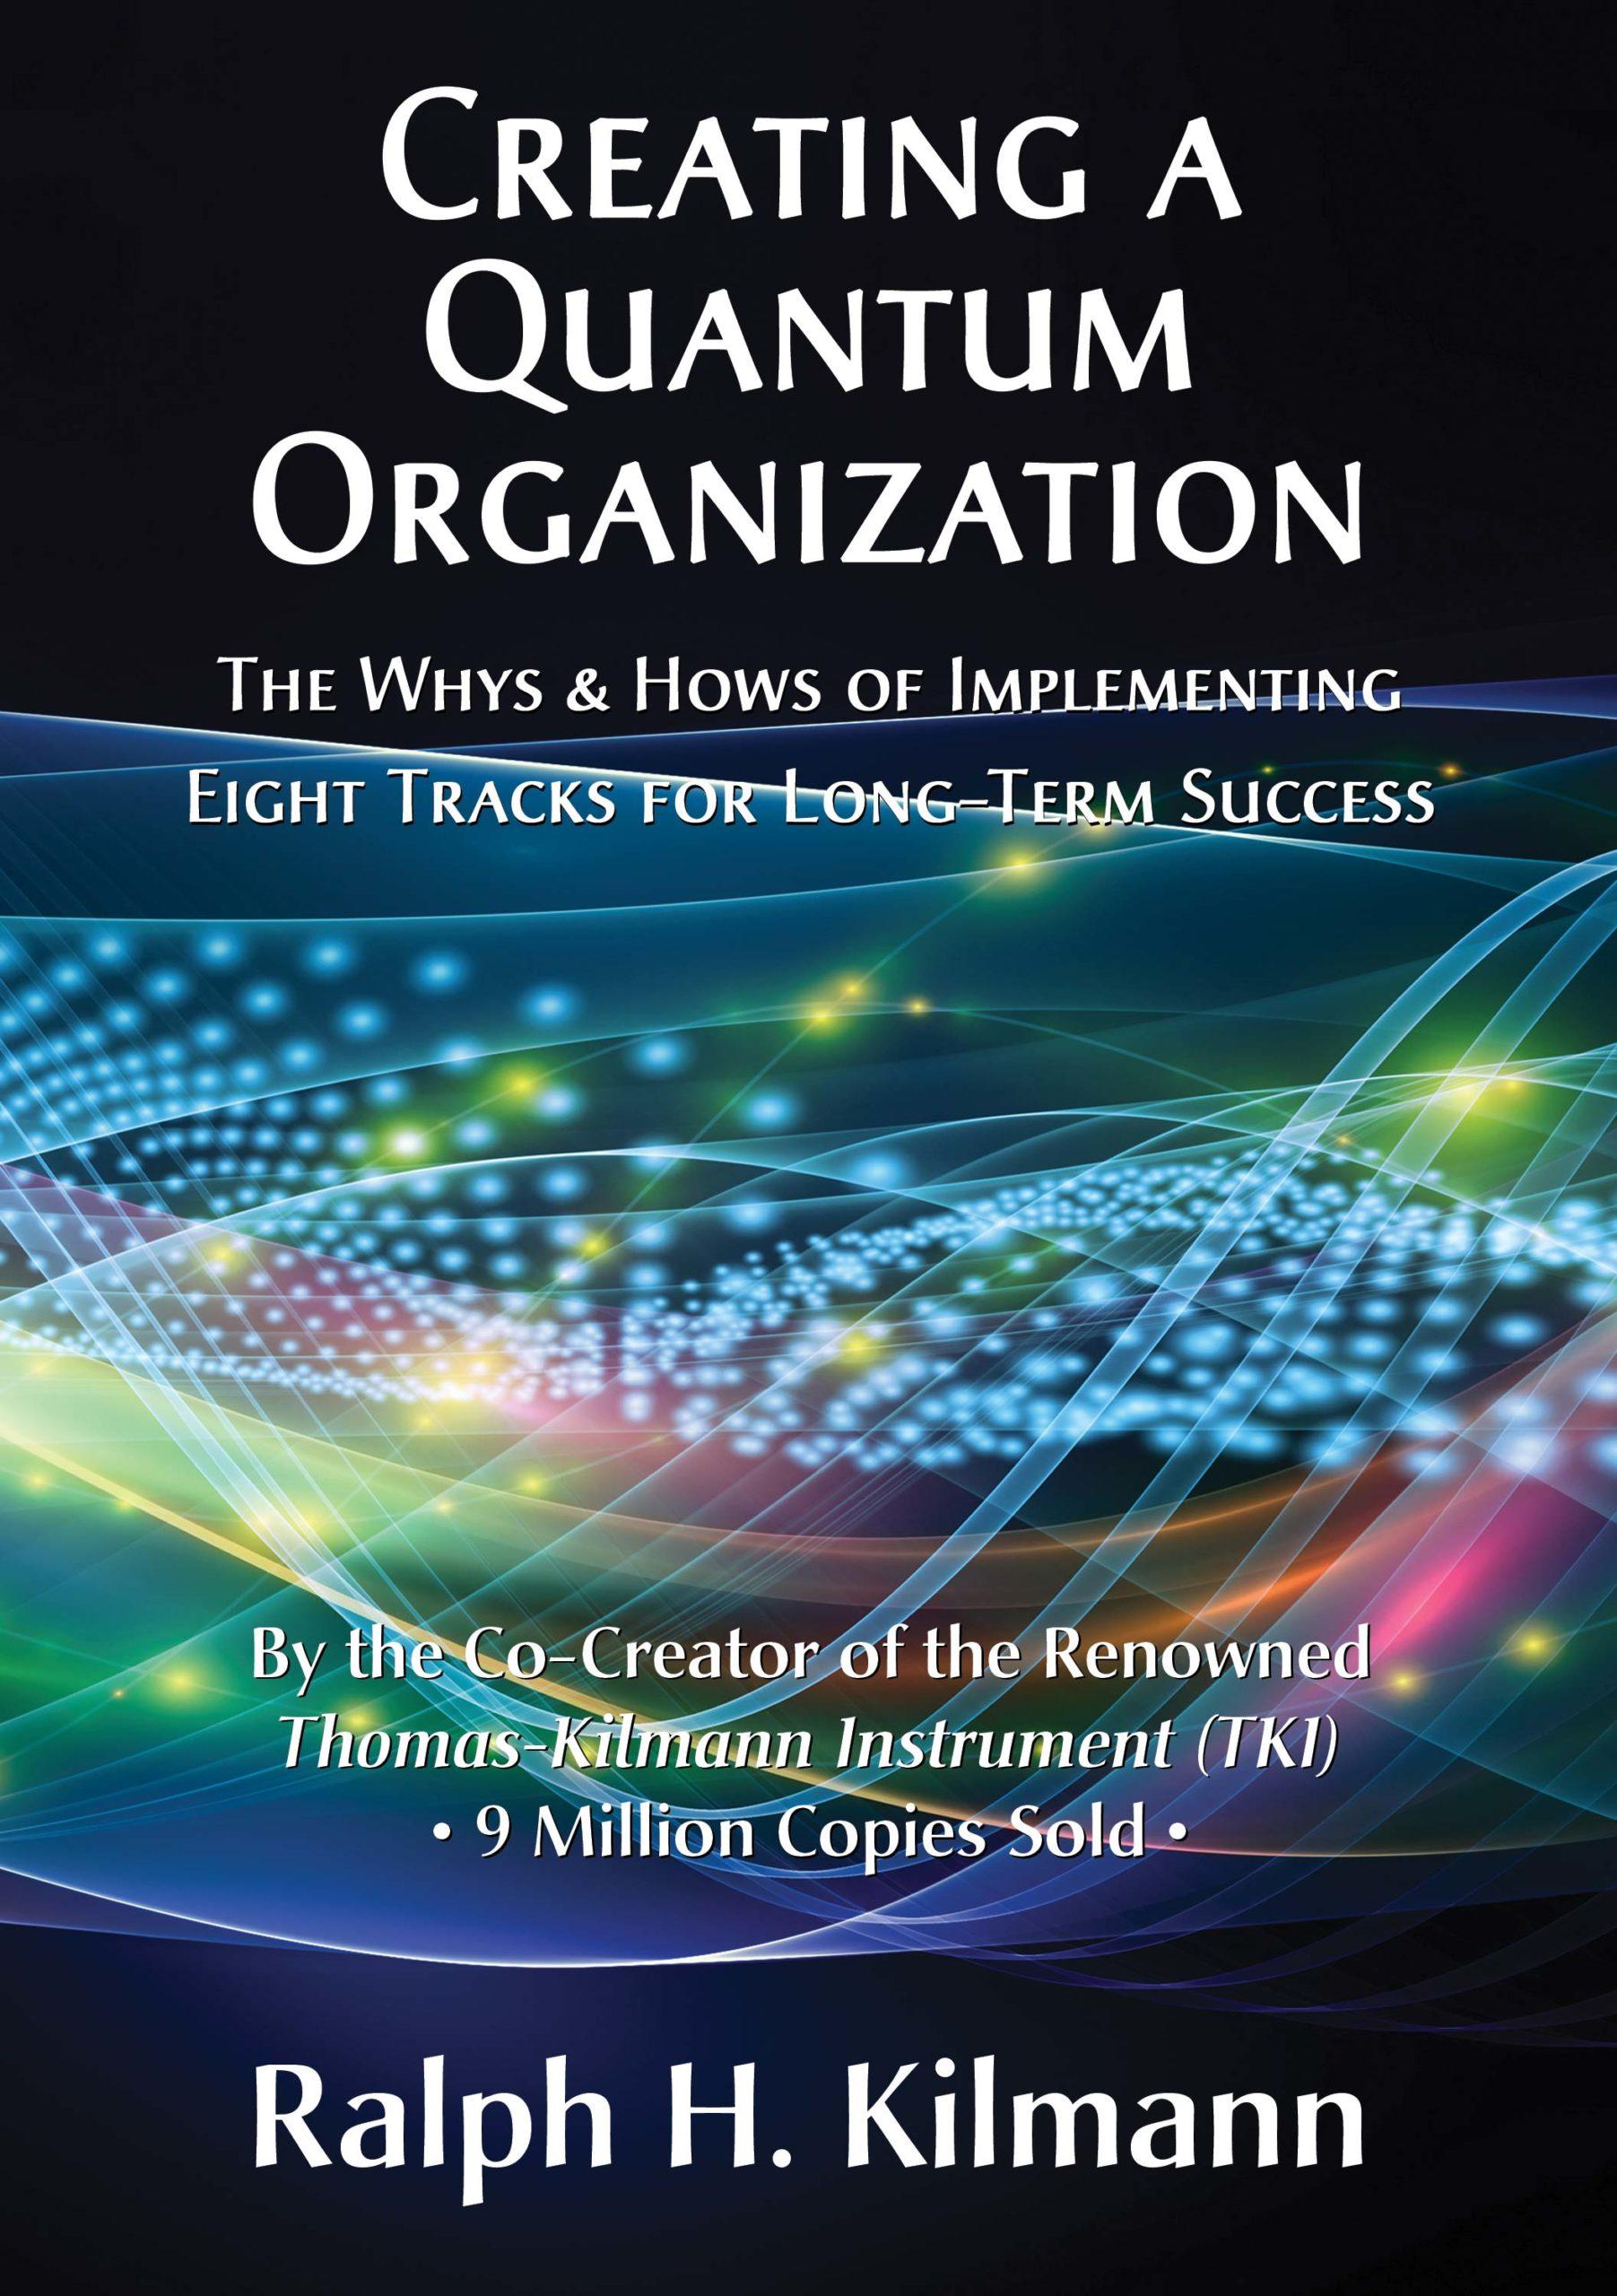 Creating a Quantum Organization